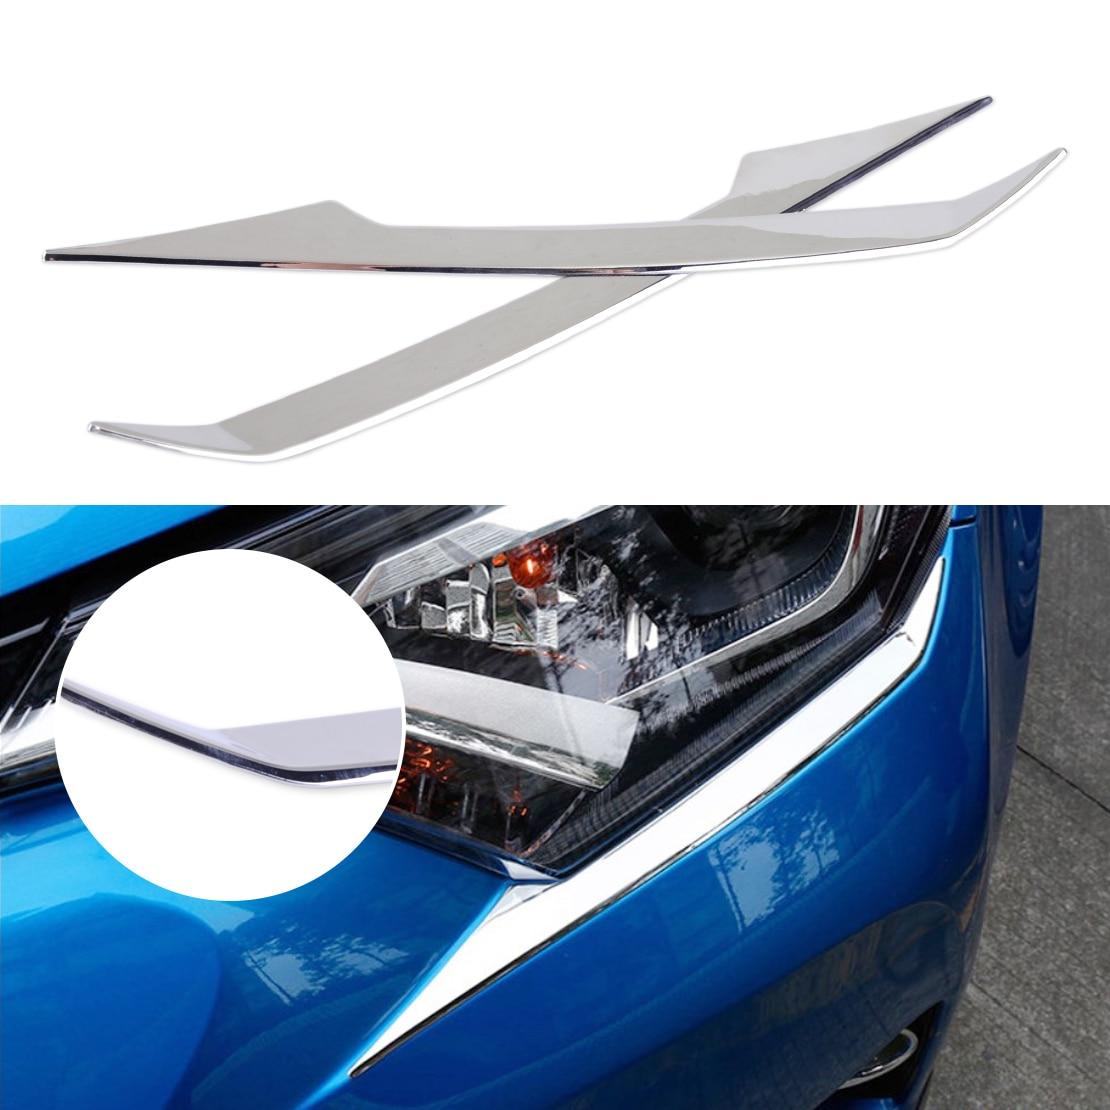 CITALL 2pcs Car styling ABS Chrome Front Head Light Eyelid Trim Molding Fit for Toyota RAV4 2016 2017